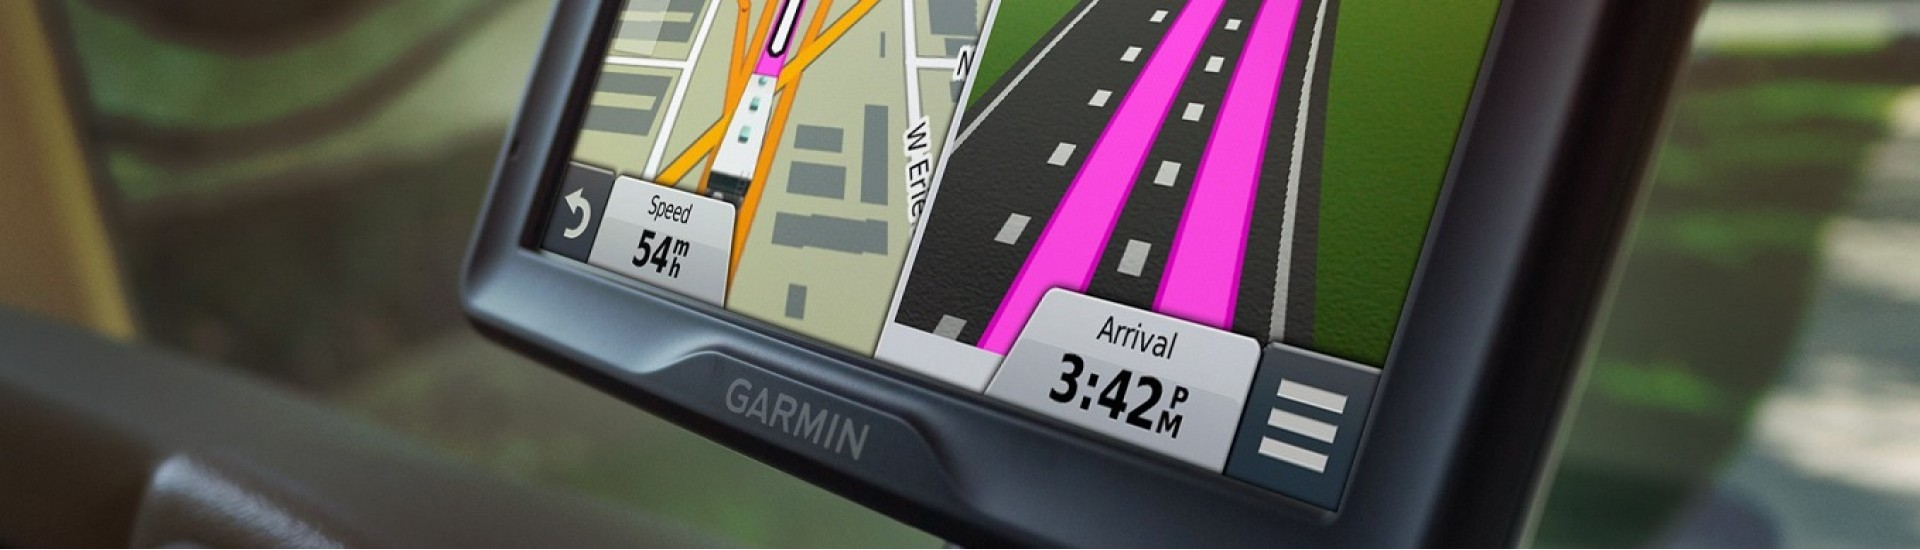 سیستم جی پی اس خودرو ، gps navigation